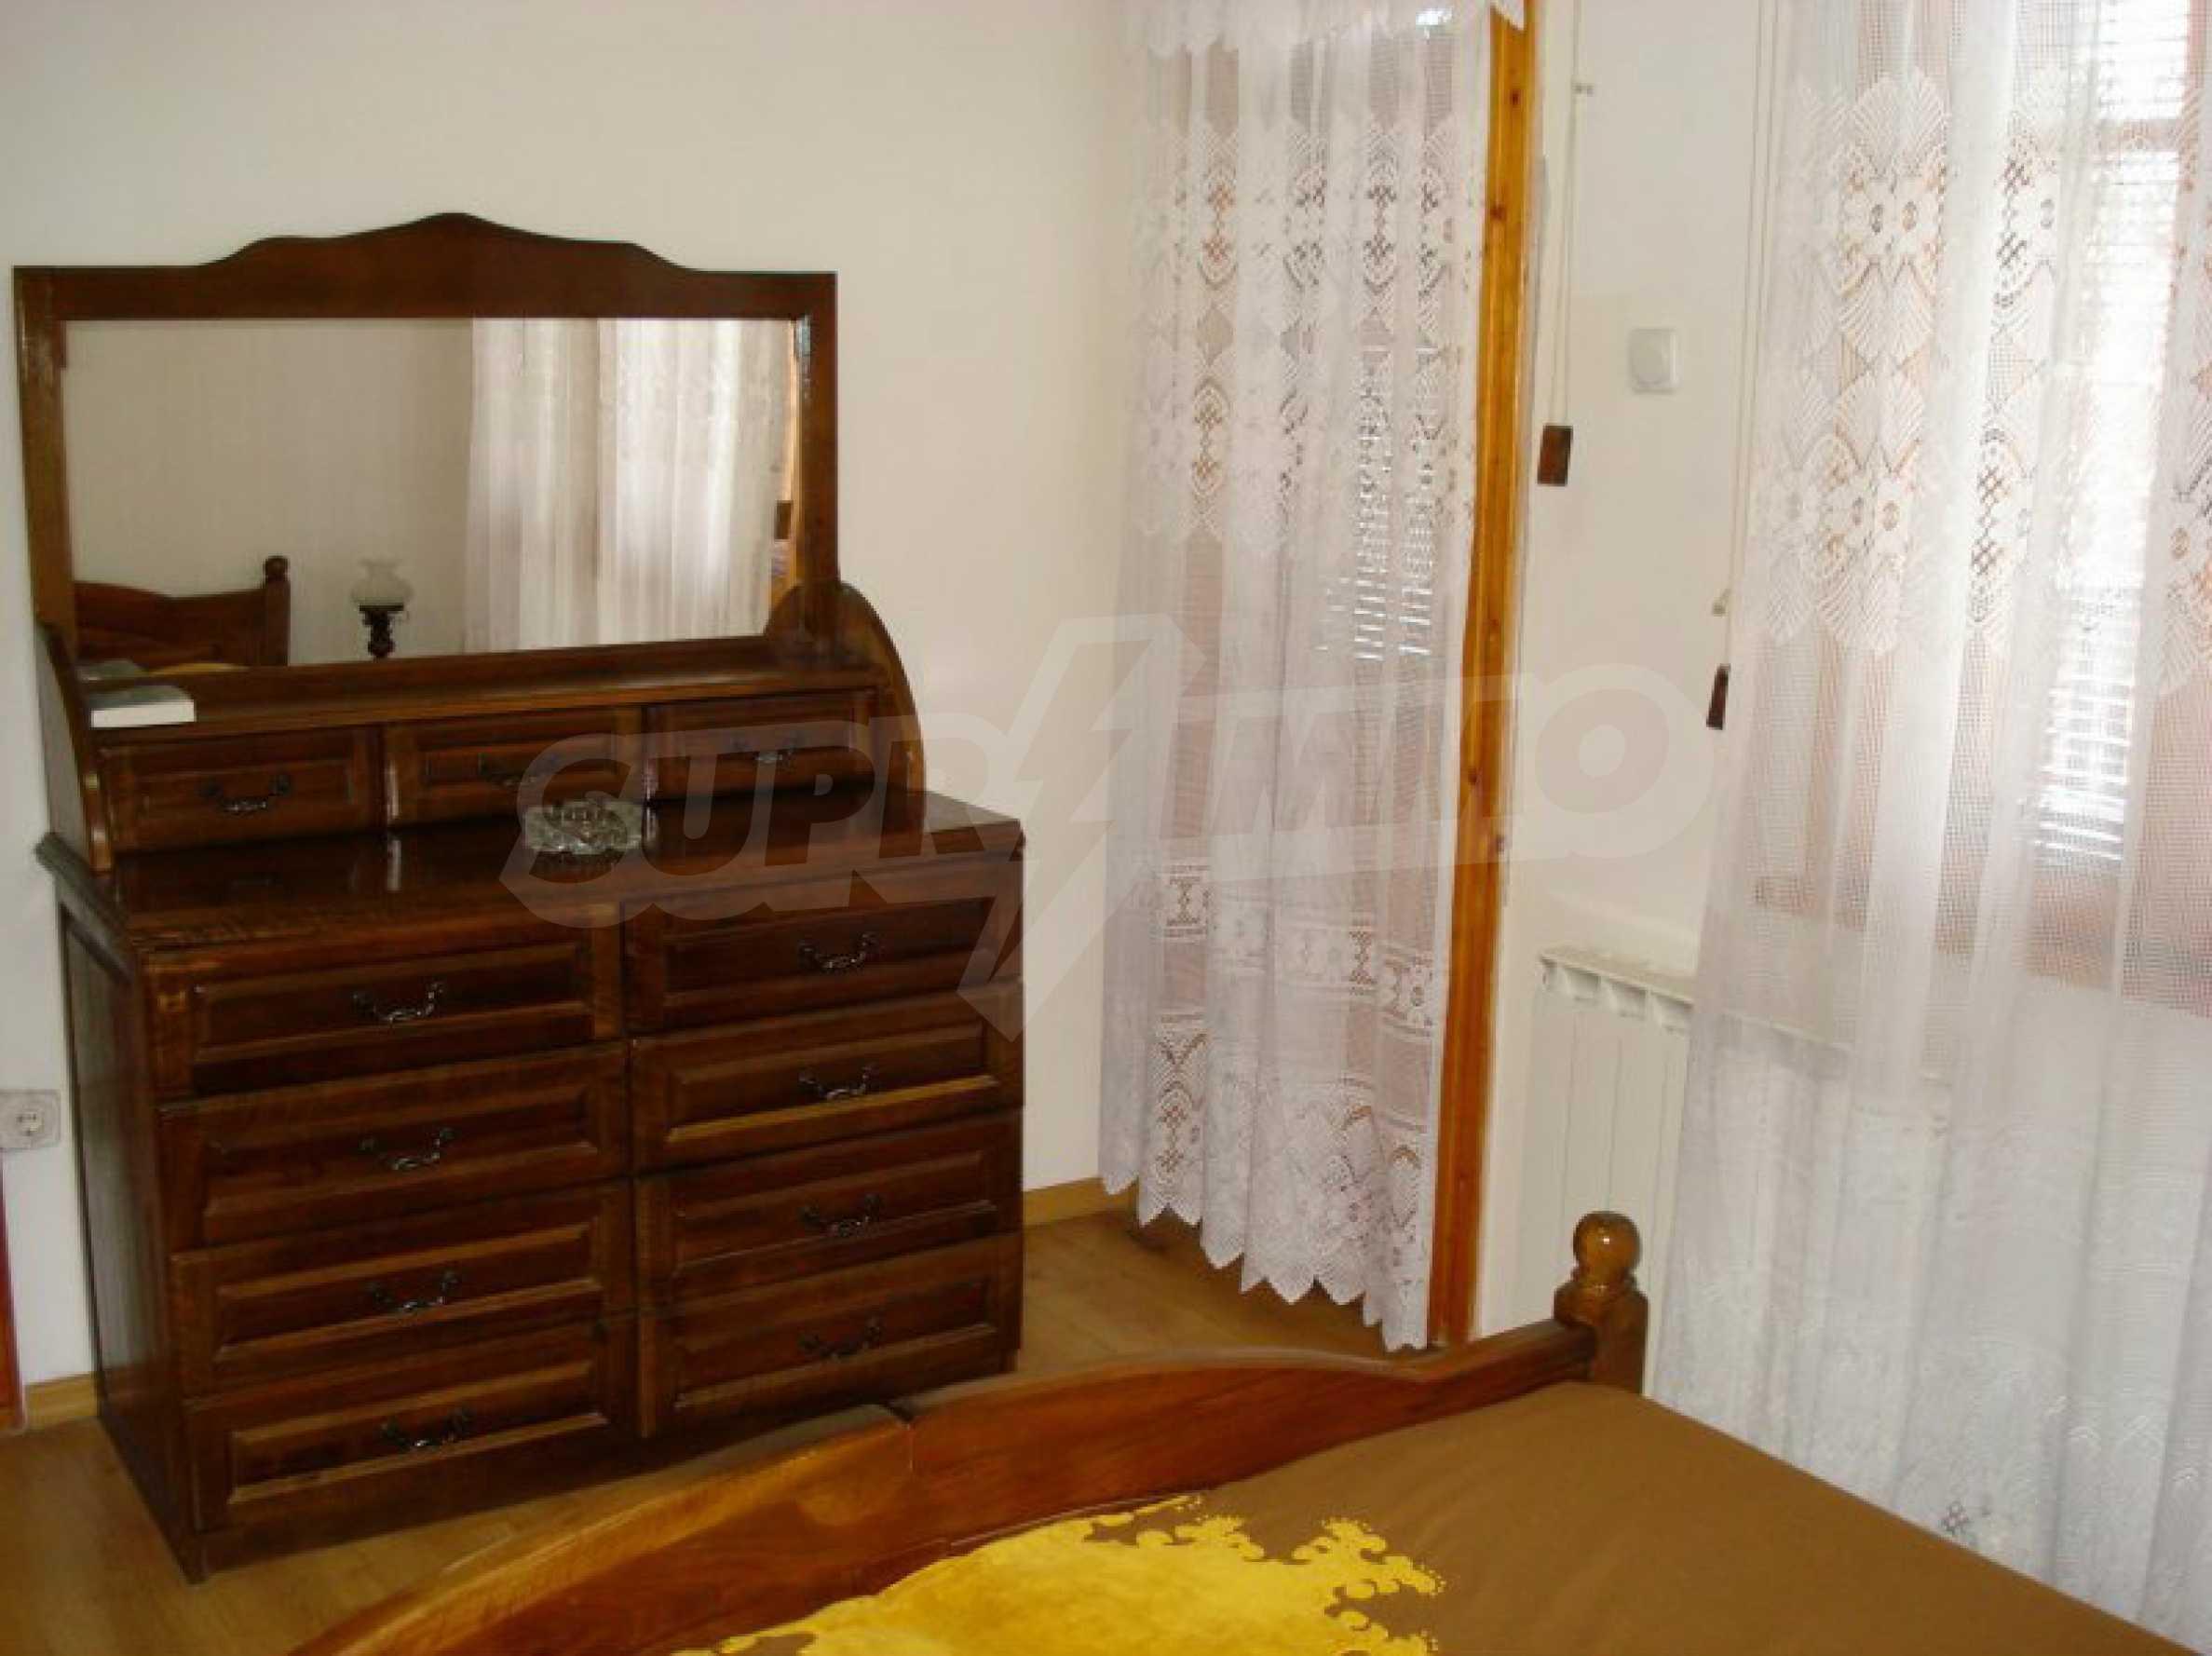 Hotelanlage mit Restaurant am Ufer des Flusses Osam in Lovech 33